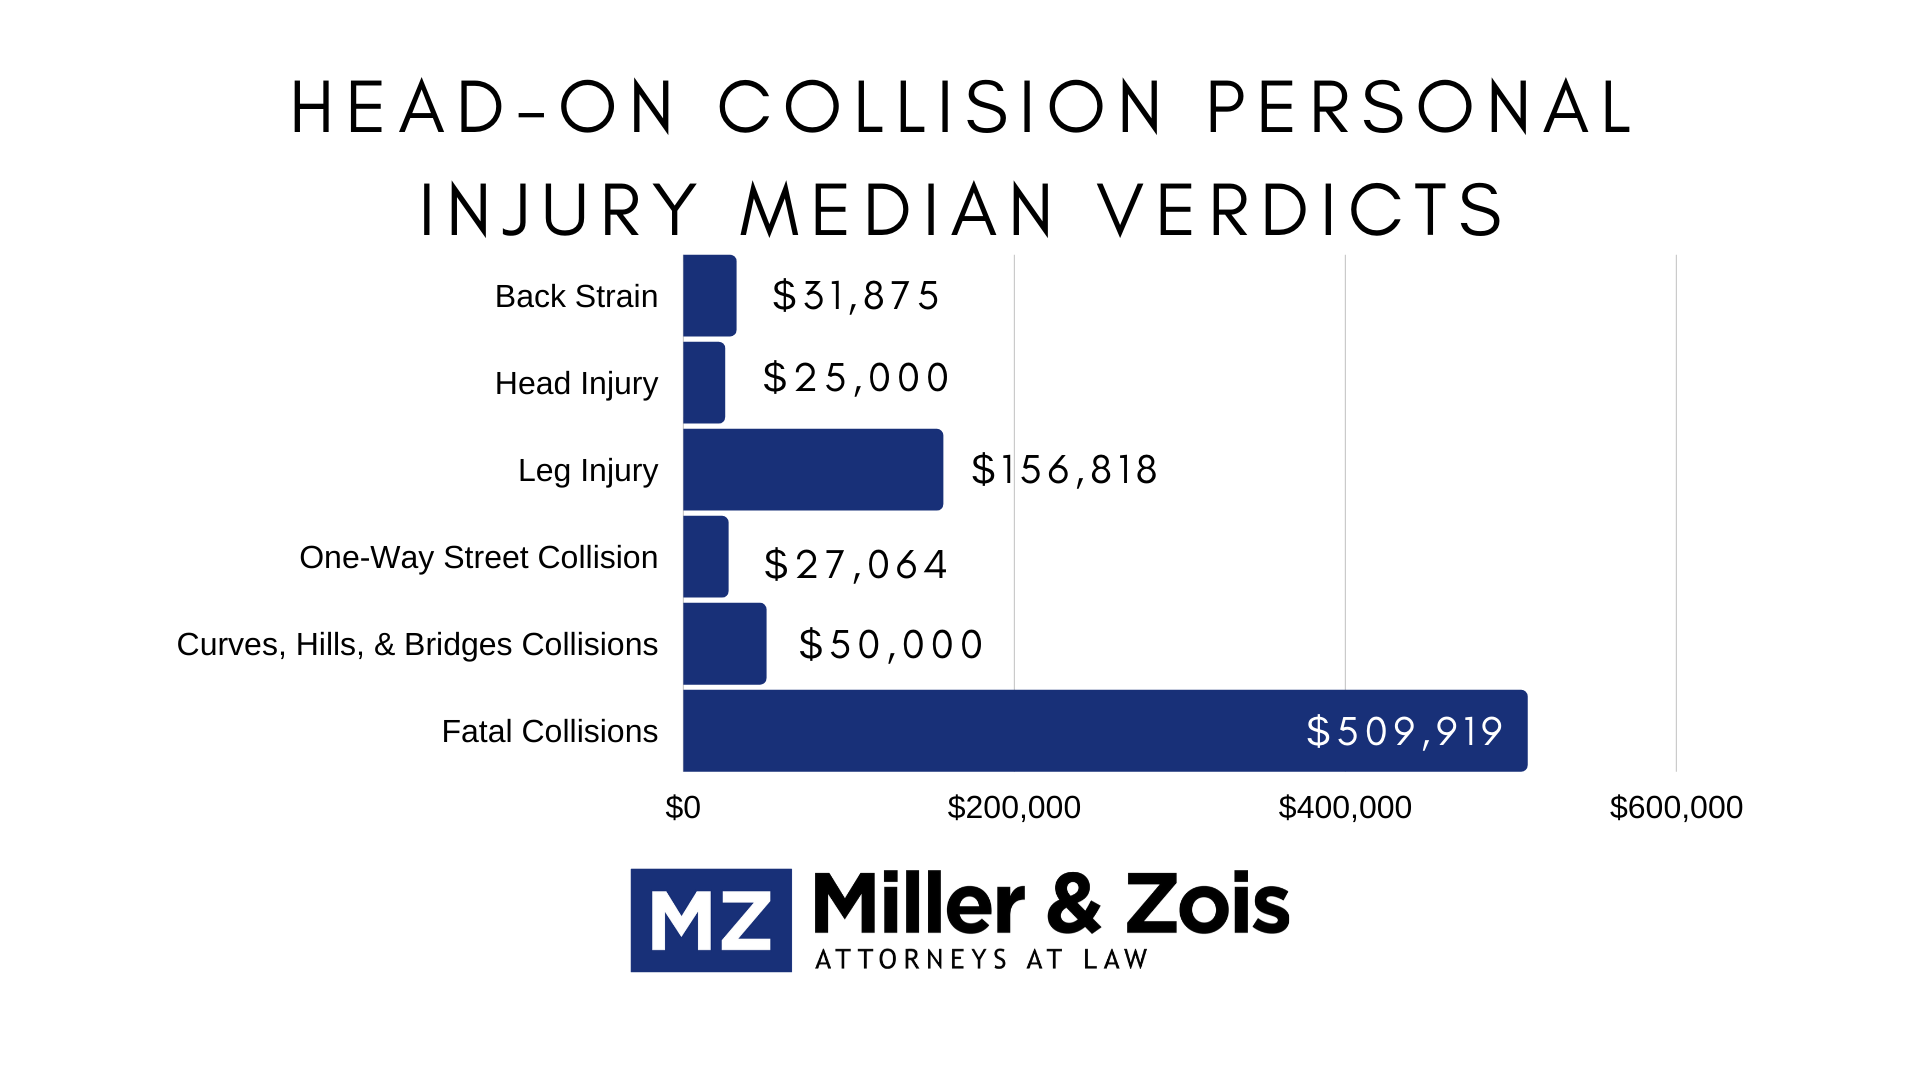 head-on collision verdicts